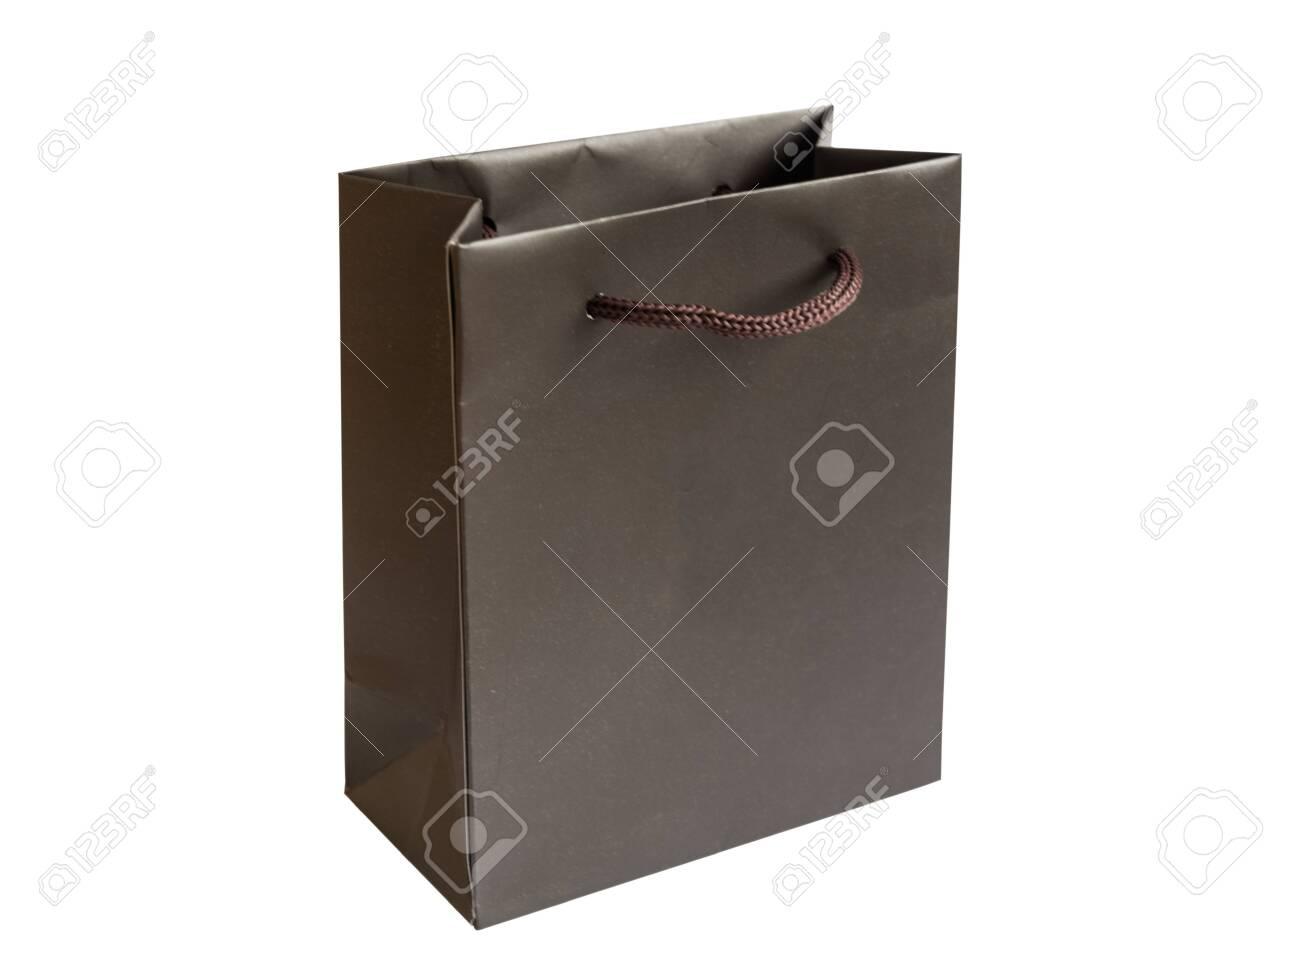 Blank paper gift bag isolated on white background. Shopping bag. Mockup for design. - 147420131